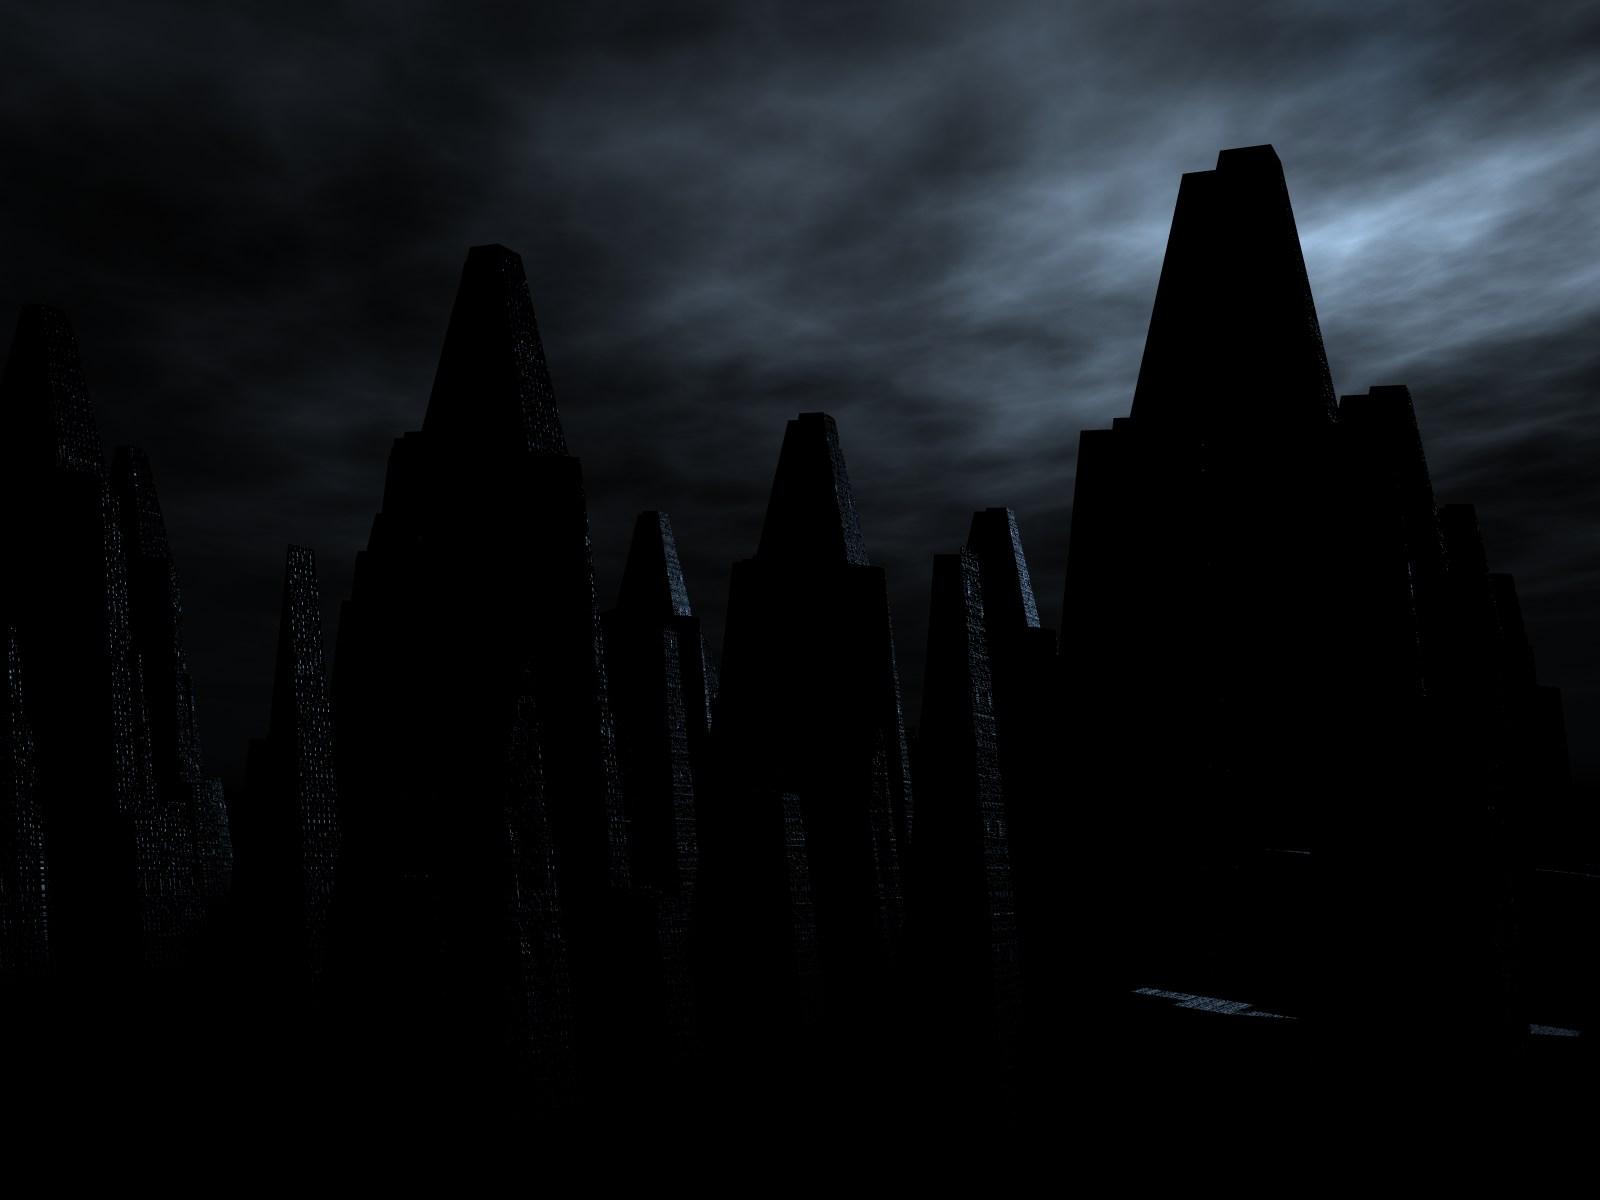 Sombre - City  Fond d'écran